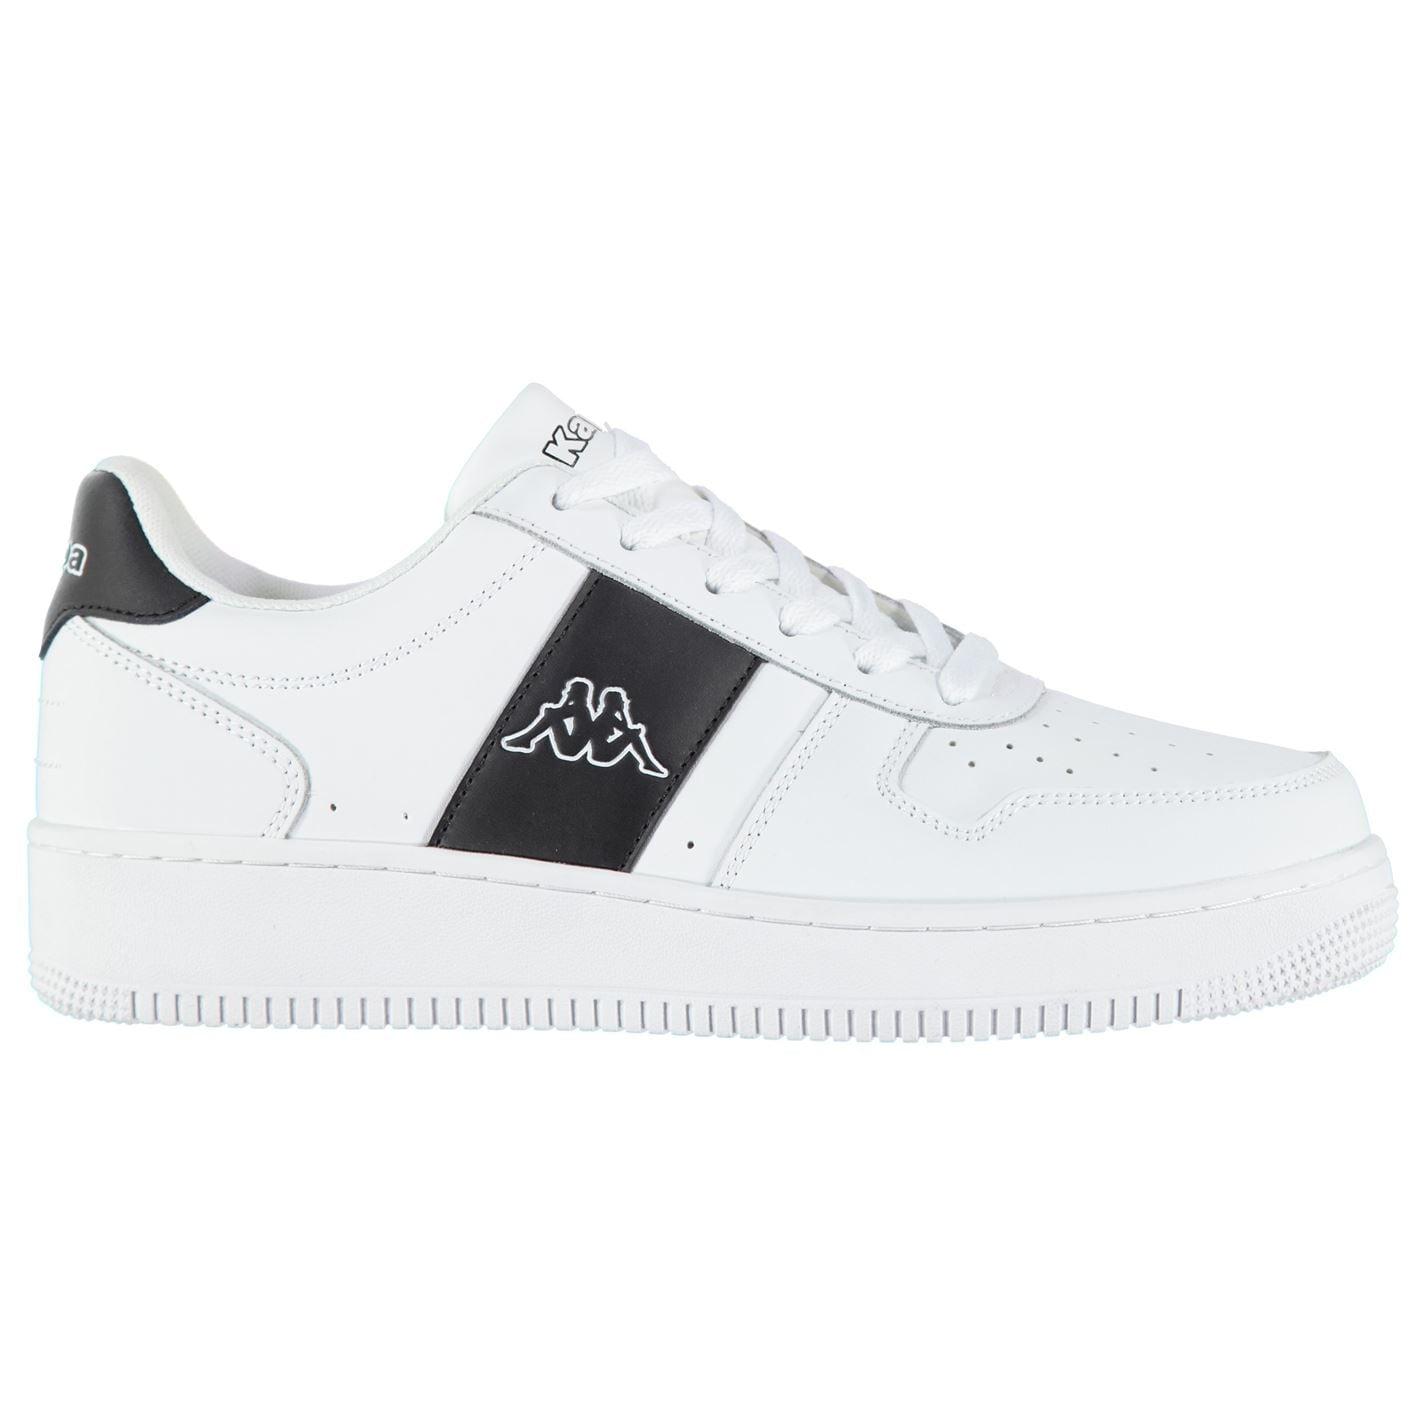 Adidasi sport Kappa La Morra pentru Barbati alb negru